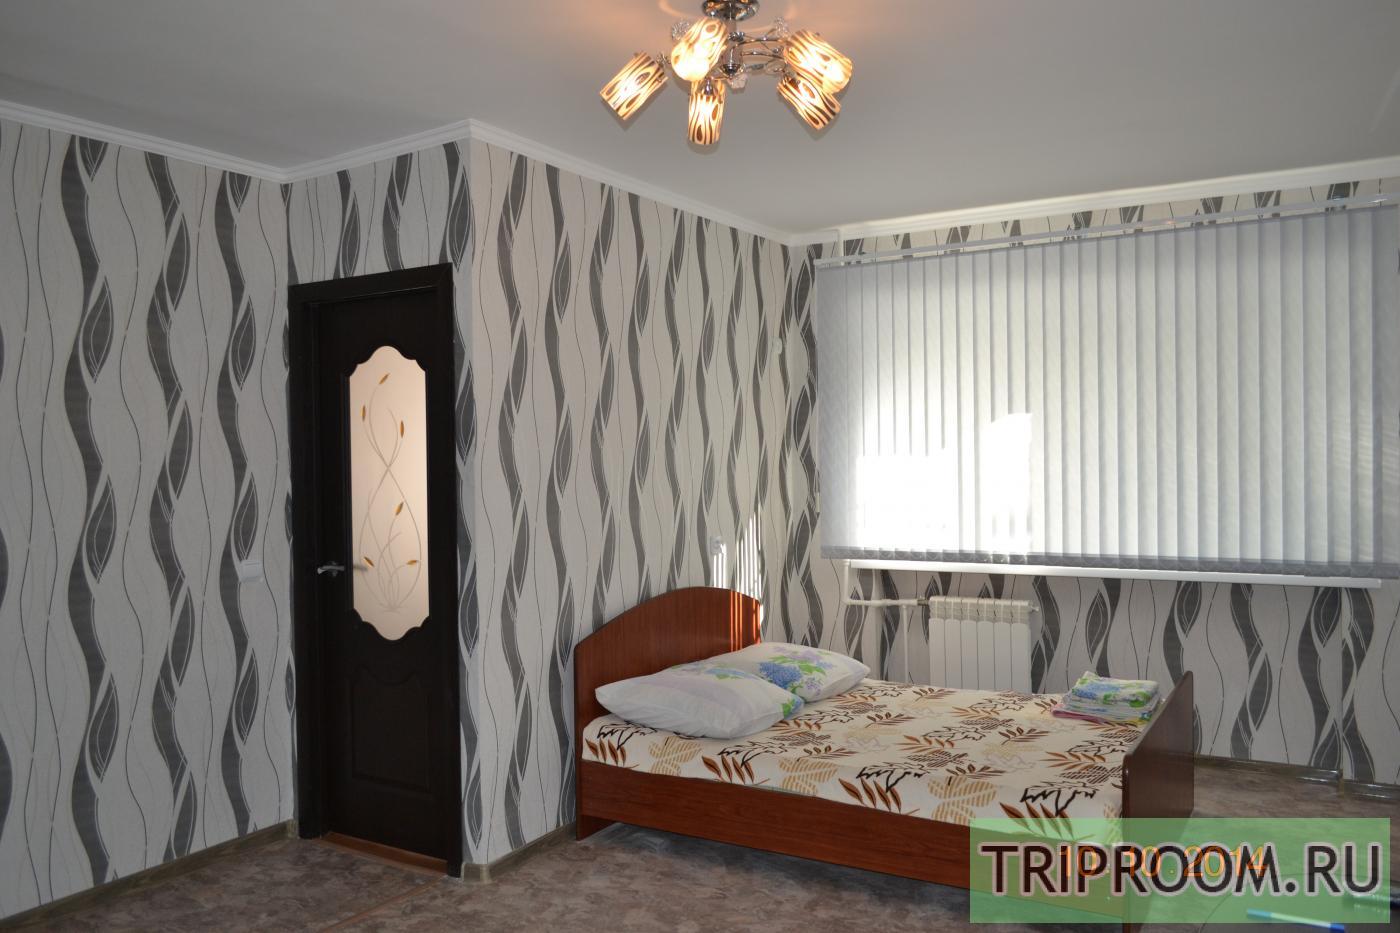 1-комнатная квартира посуточно (вариант № 7477), ул. Фадеева улица, фото № 2